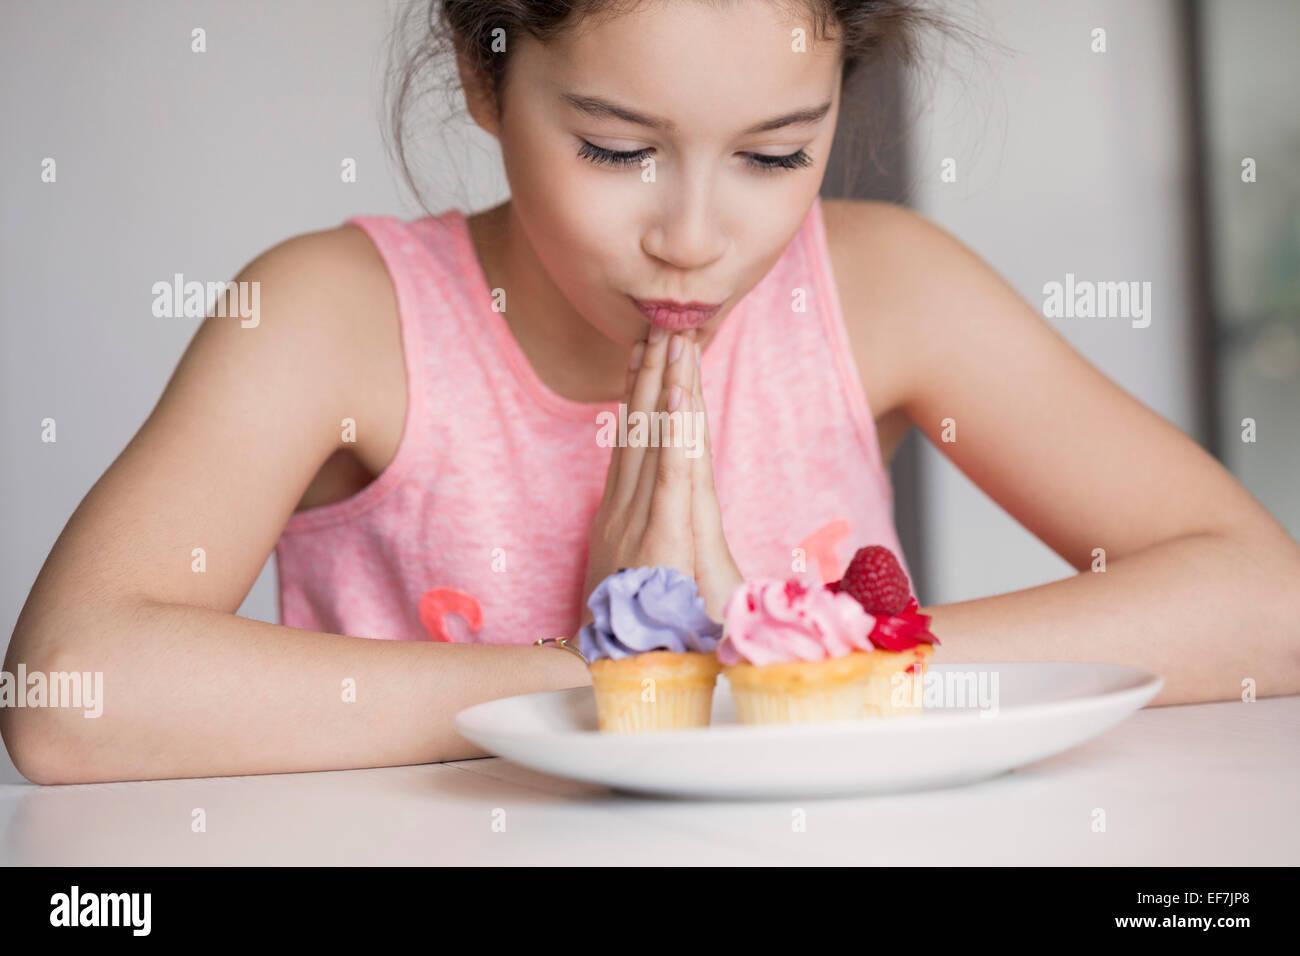 Girl looking at cupcakes - Stock Image